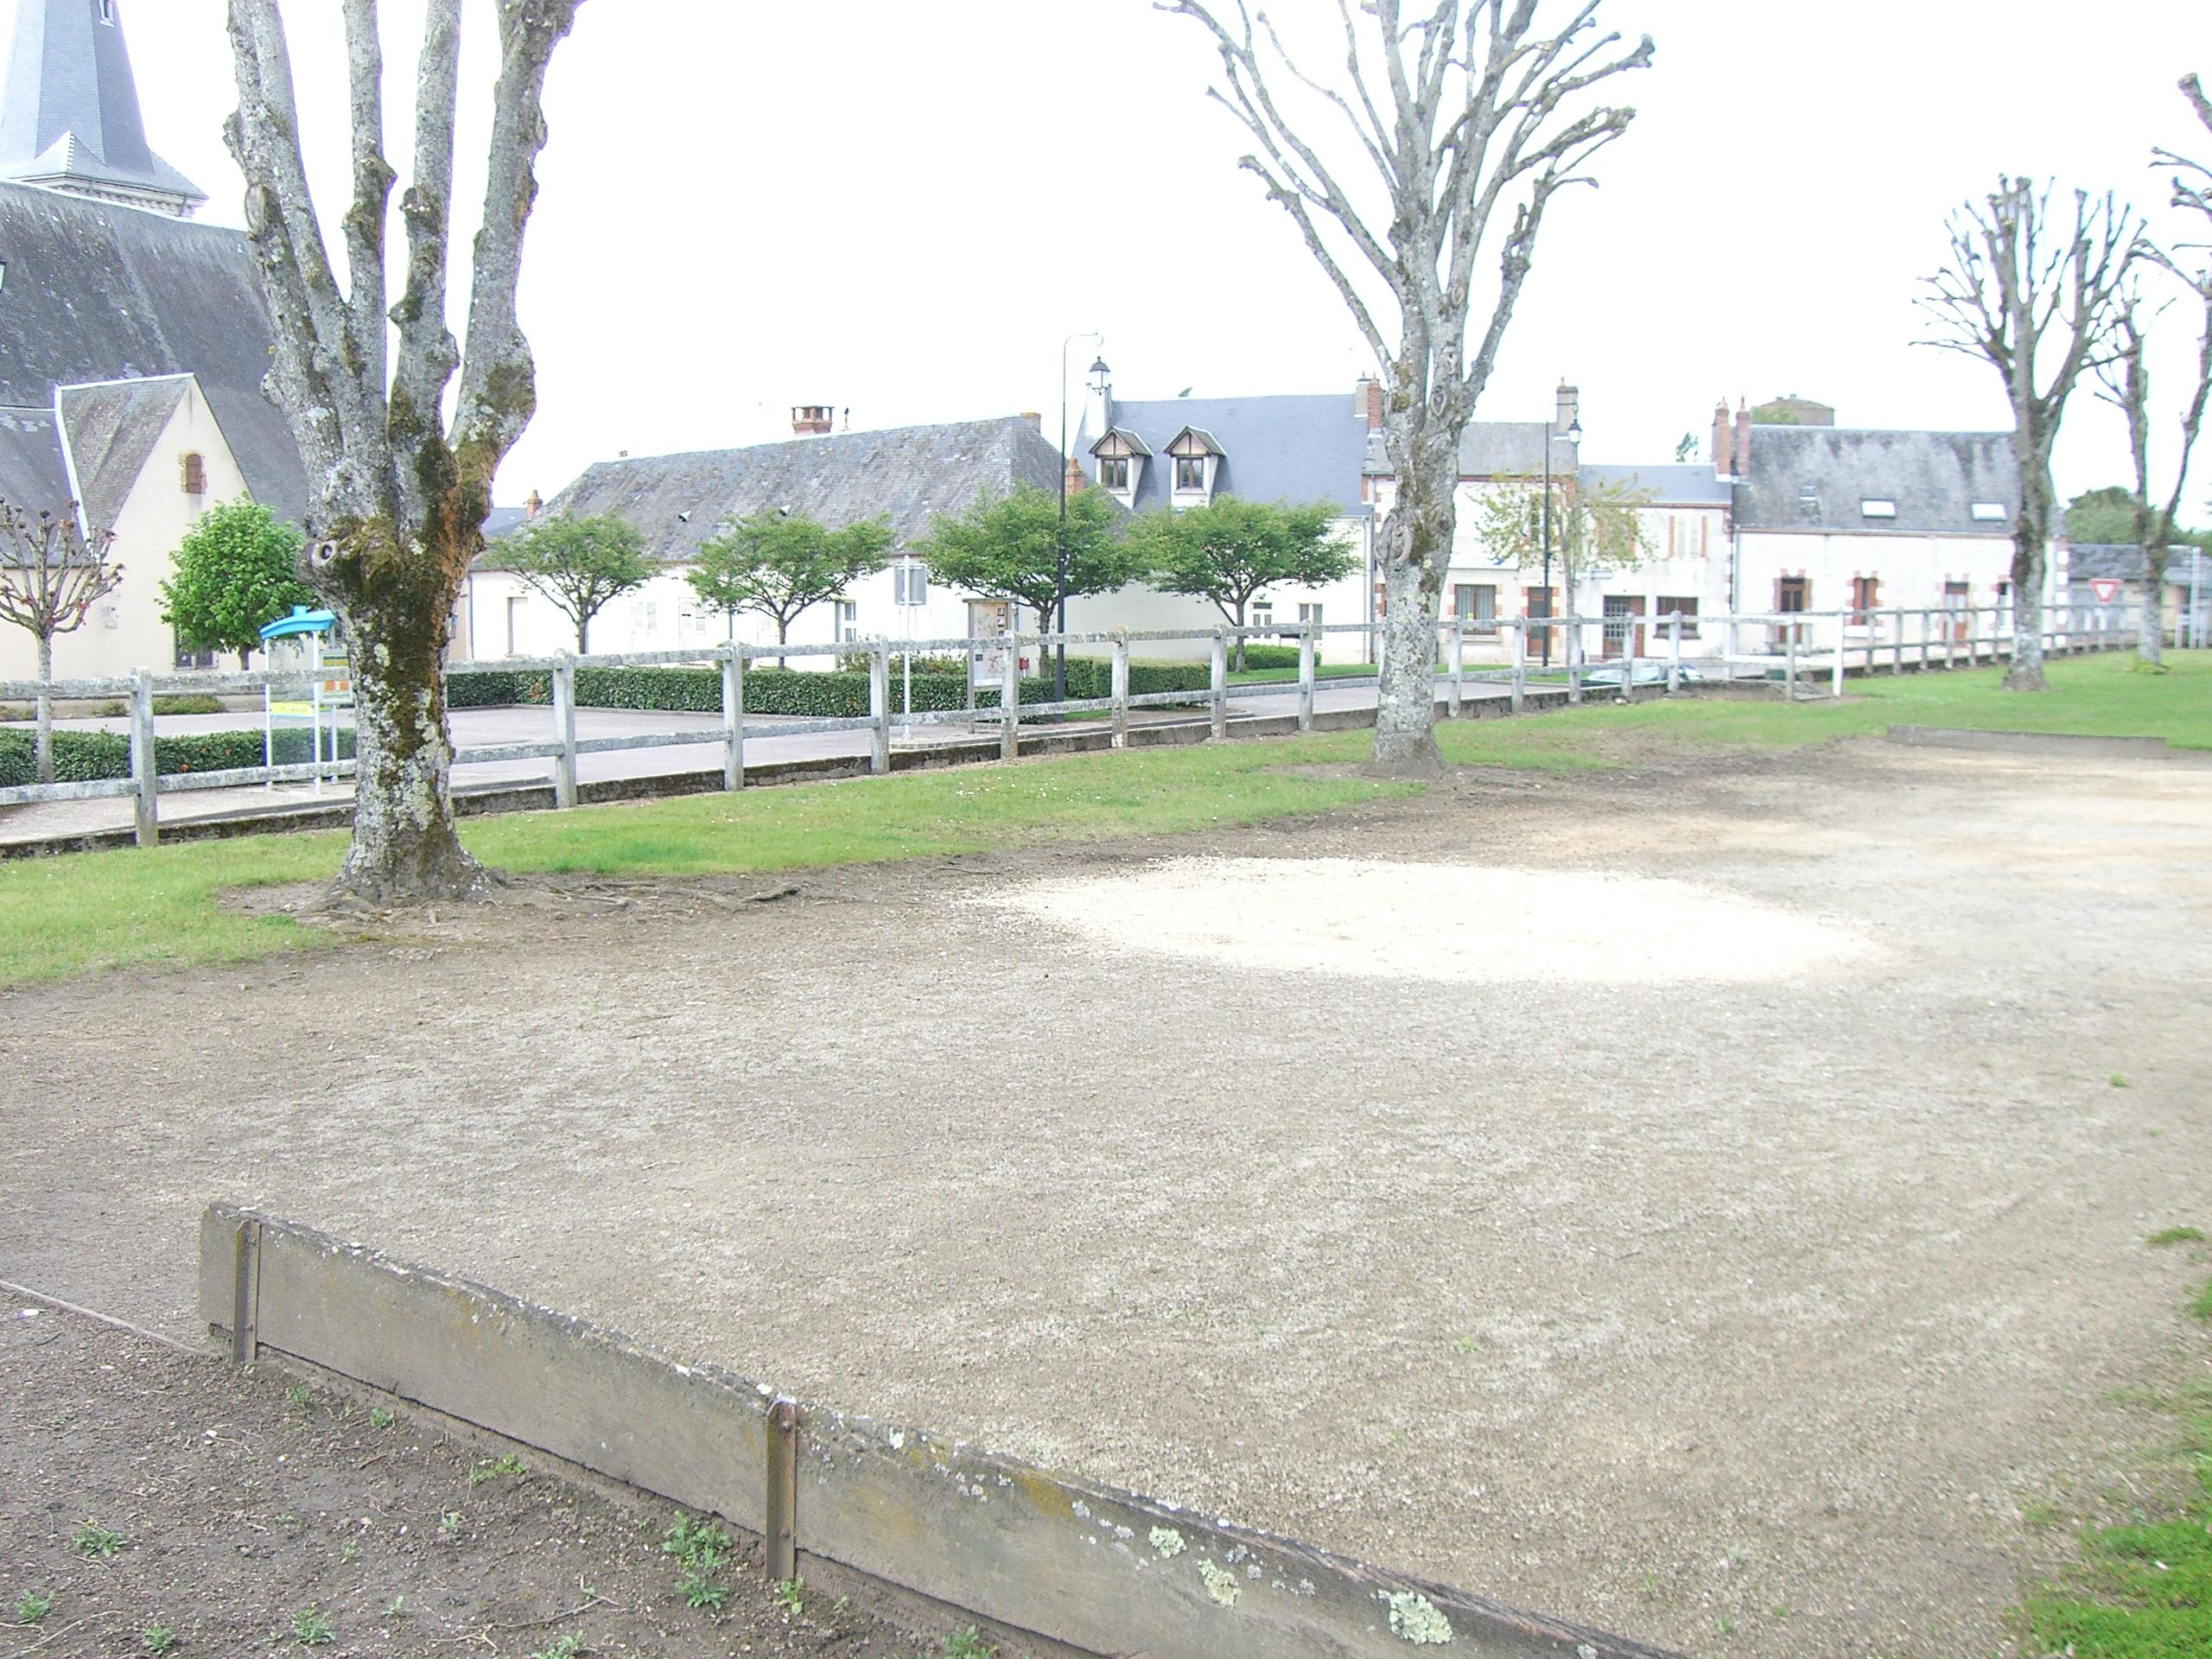 terrain-de-boules